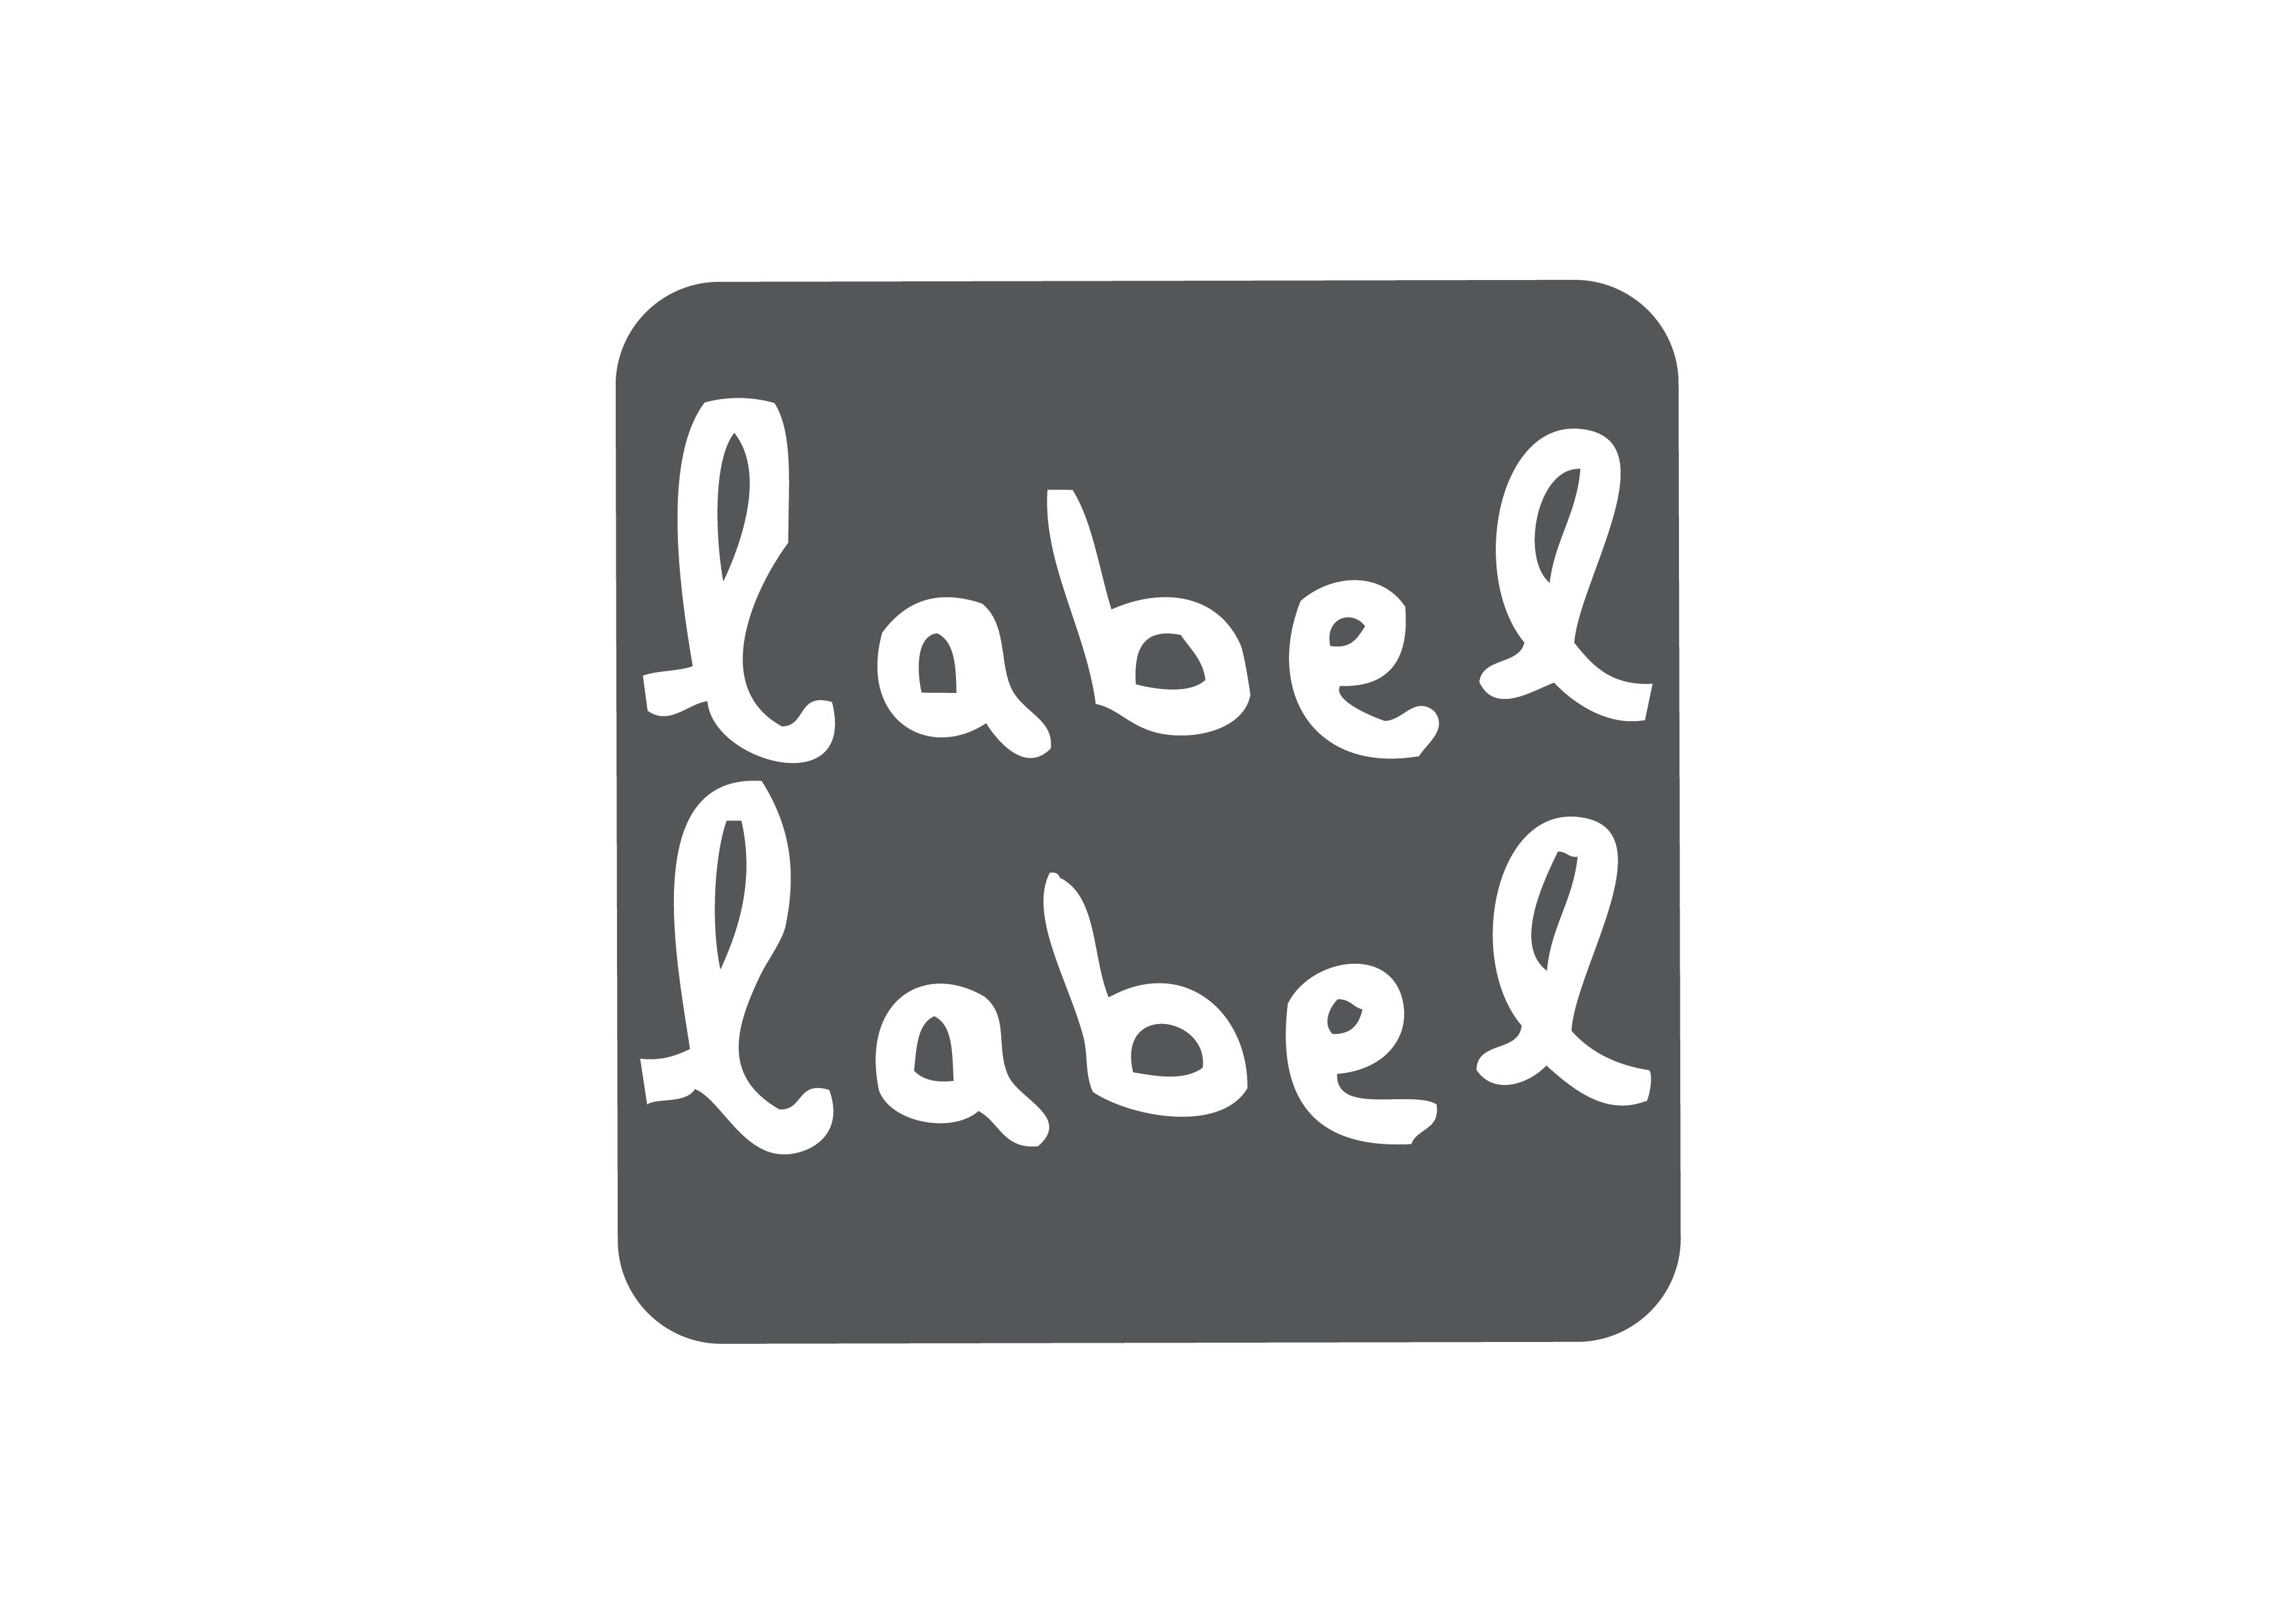 labellabel.jpg